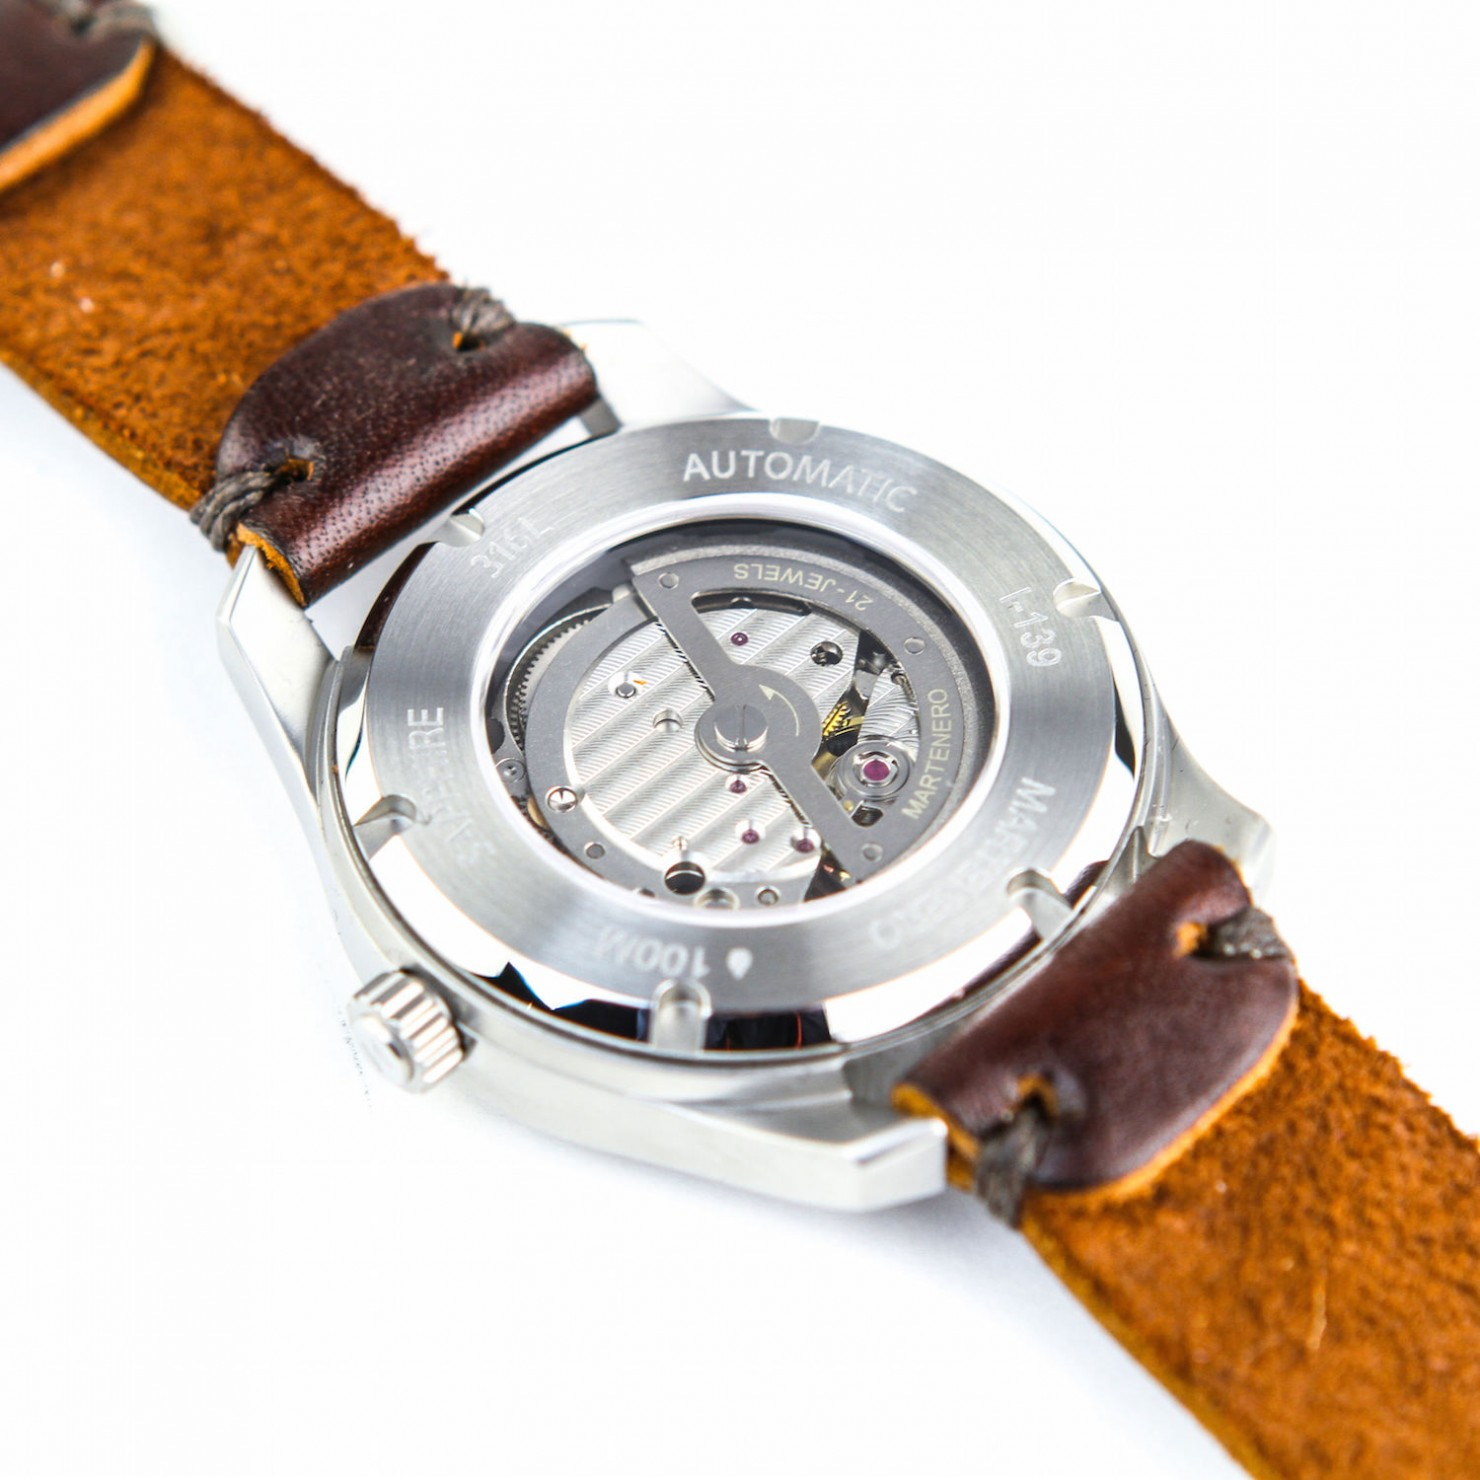 Martenero-Watch-Movement